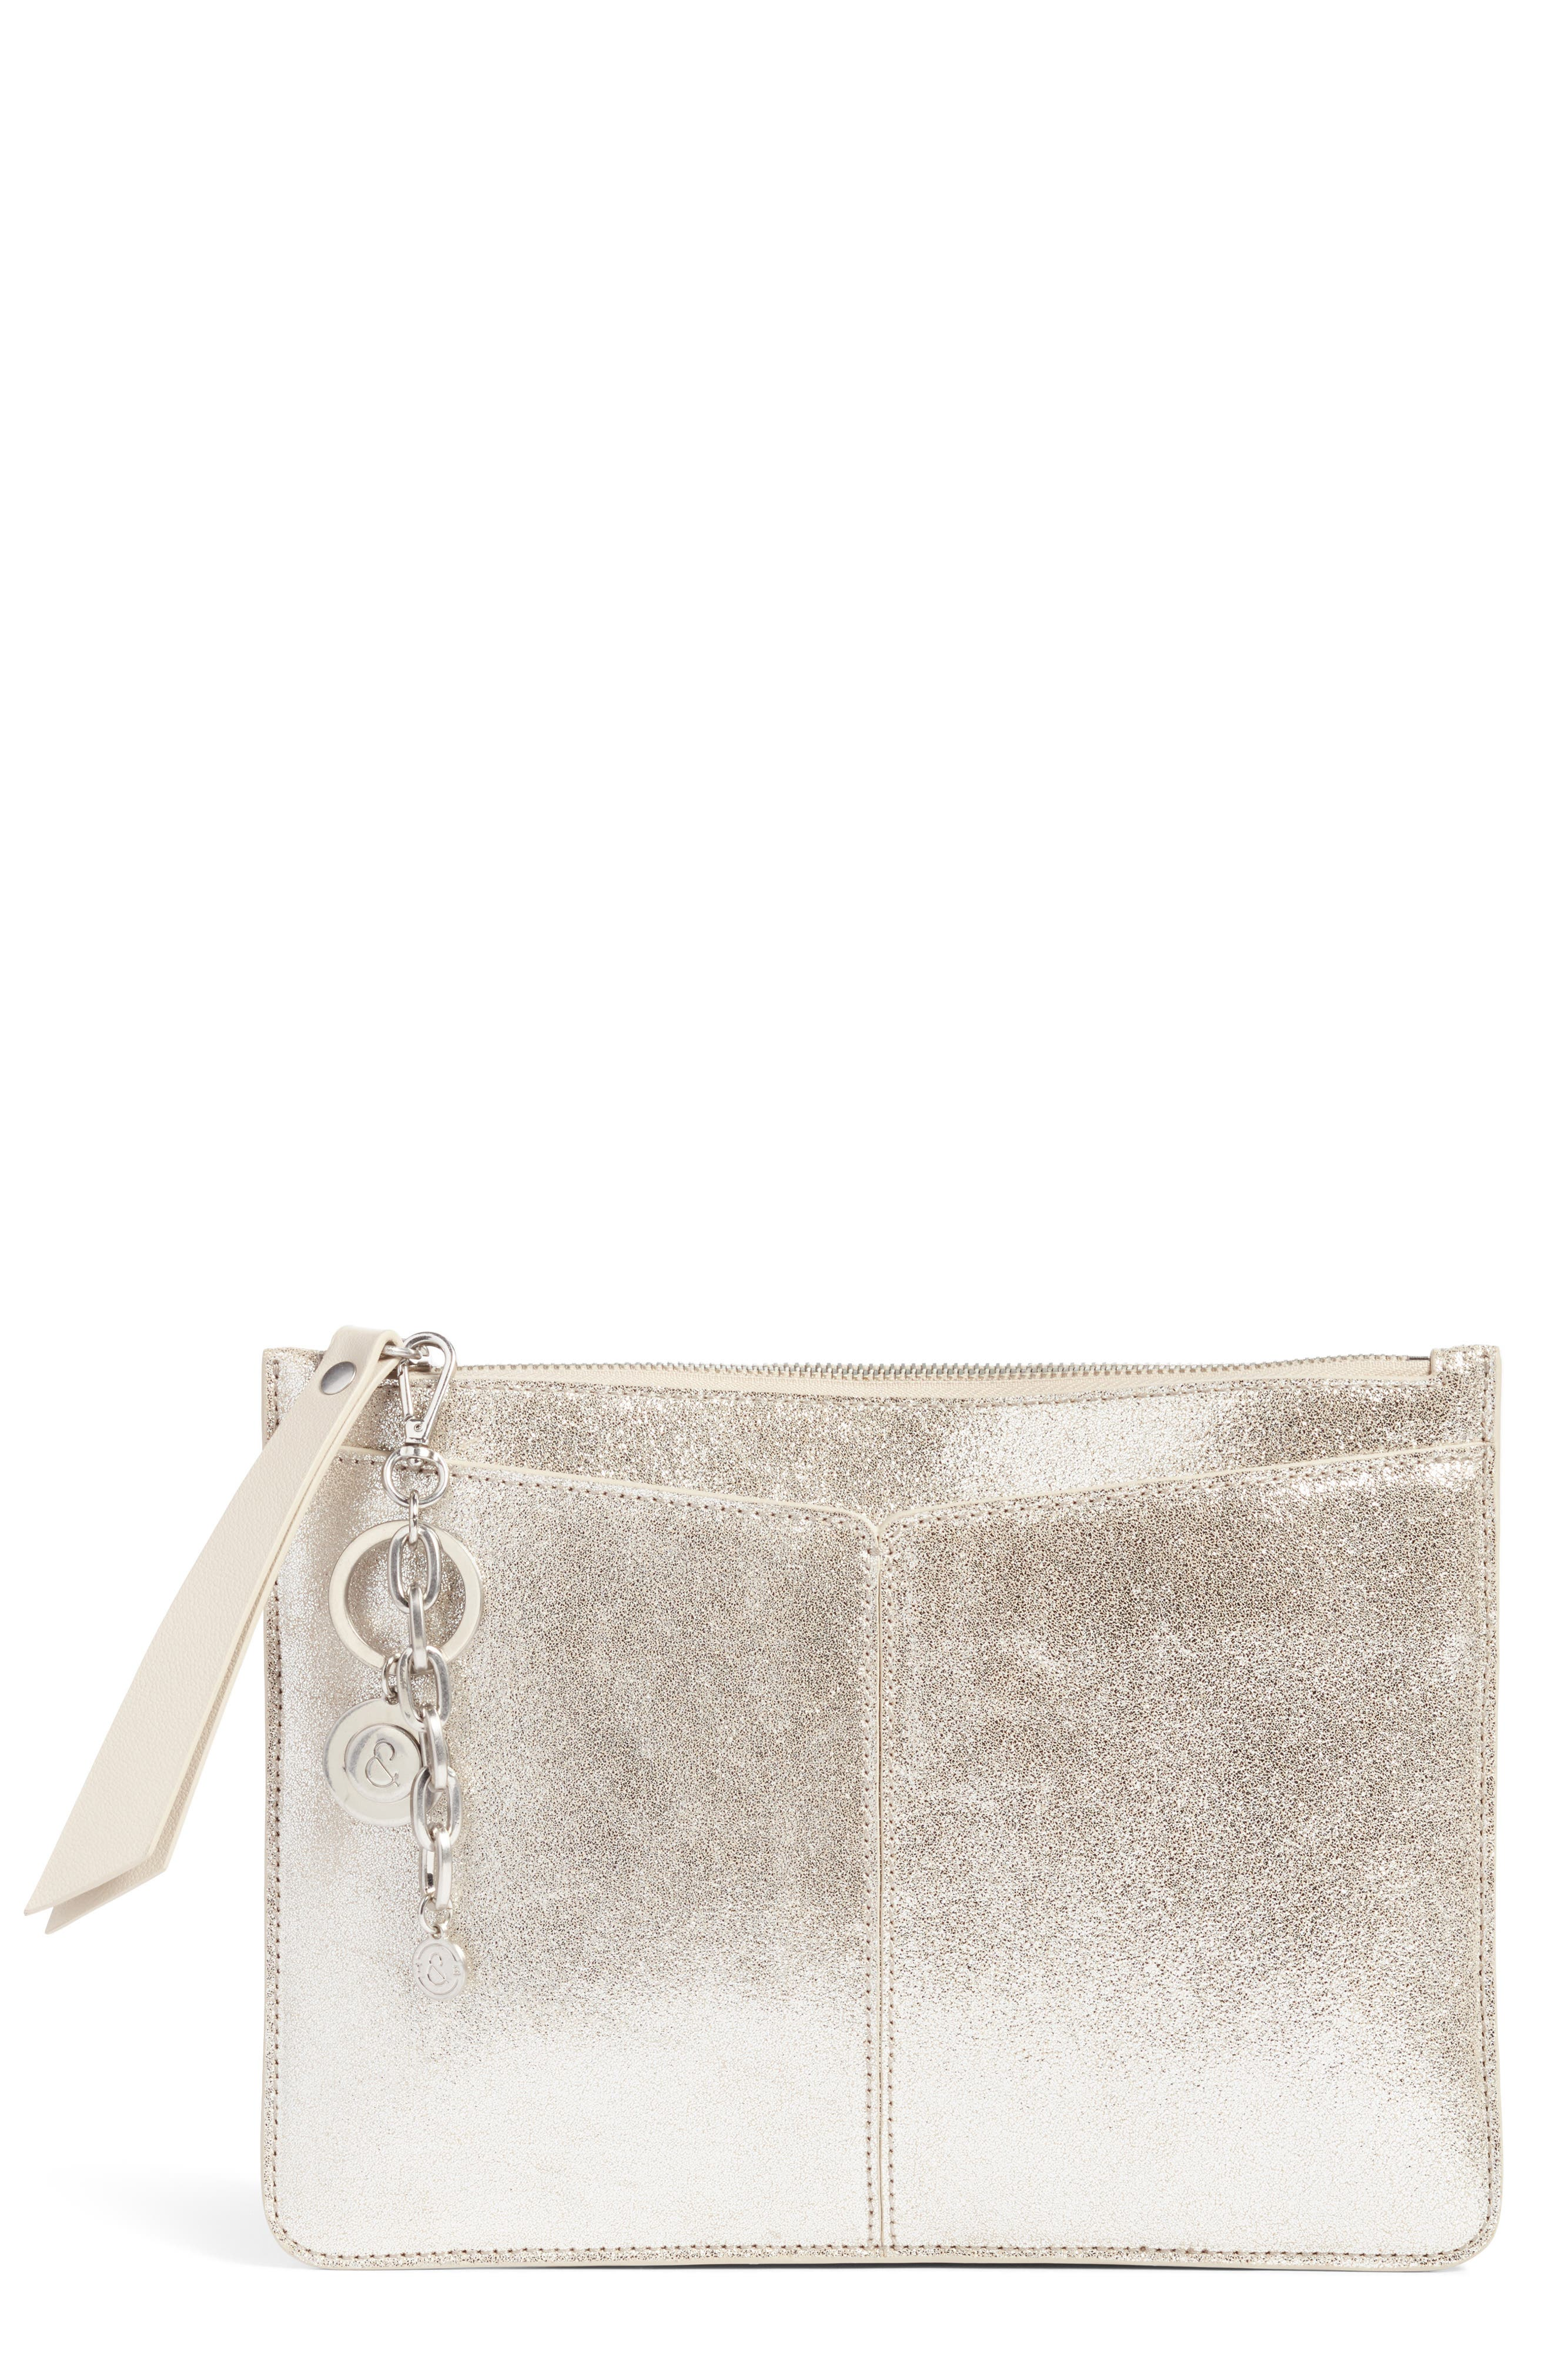 Treasure & Bond Beckett Metallic Leather Pouch